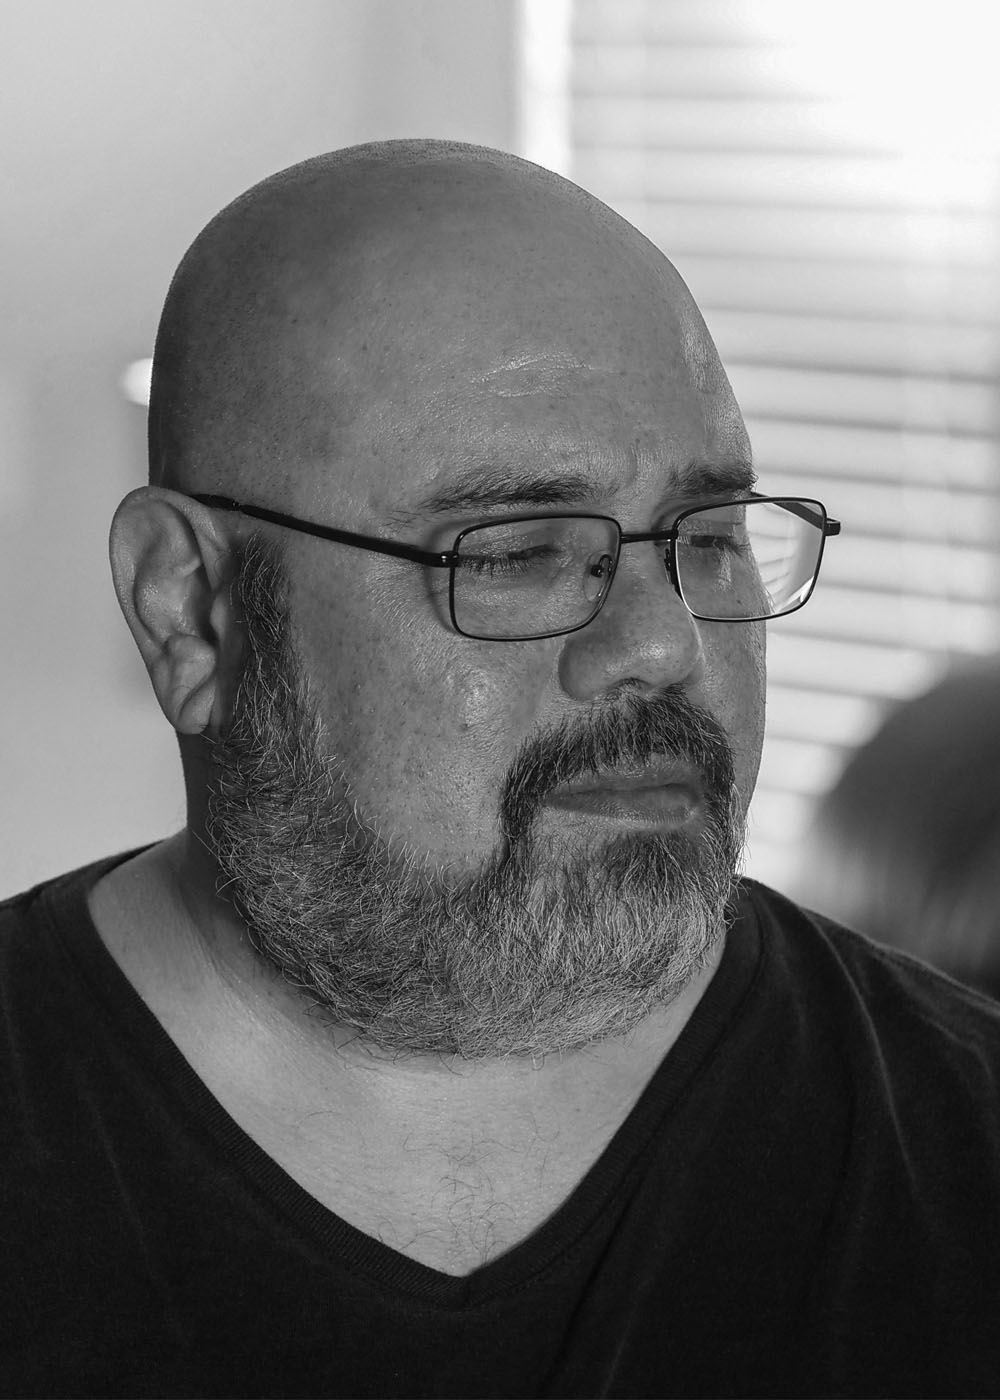 James Martinez - Aswan NFT - Pensive 2021